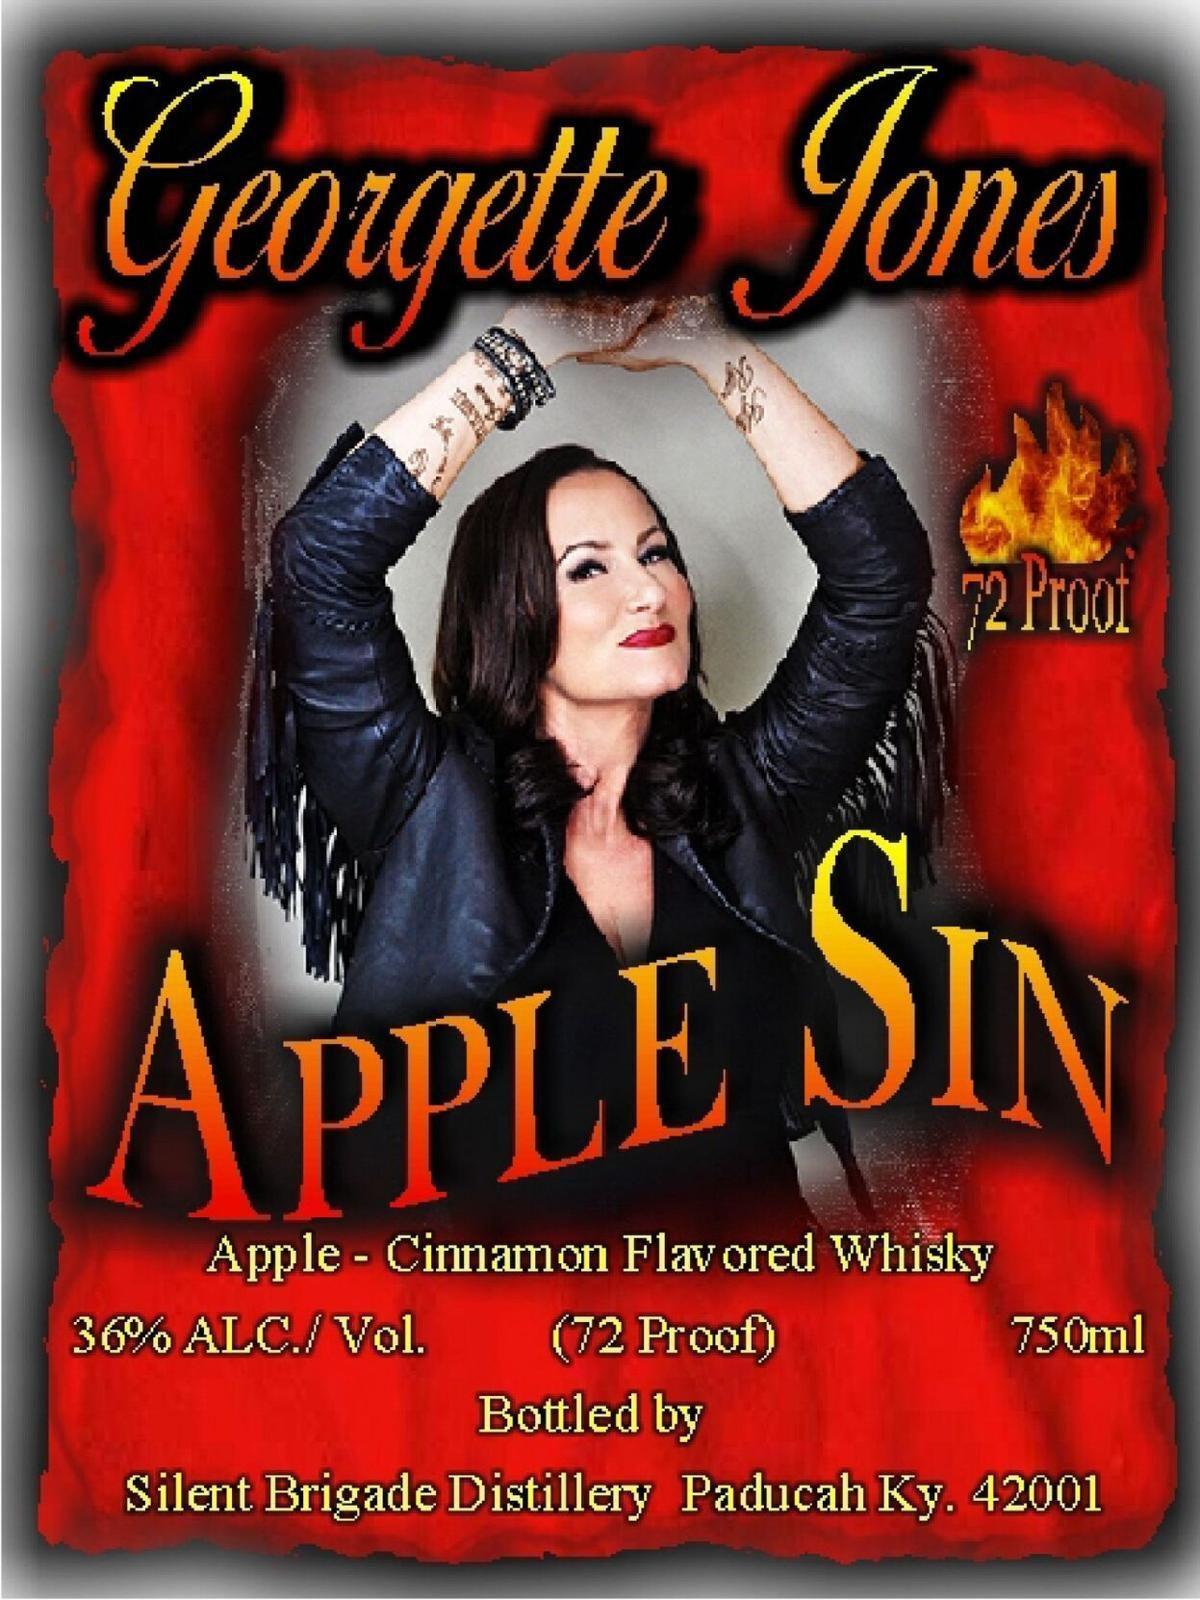 Apple Sin label